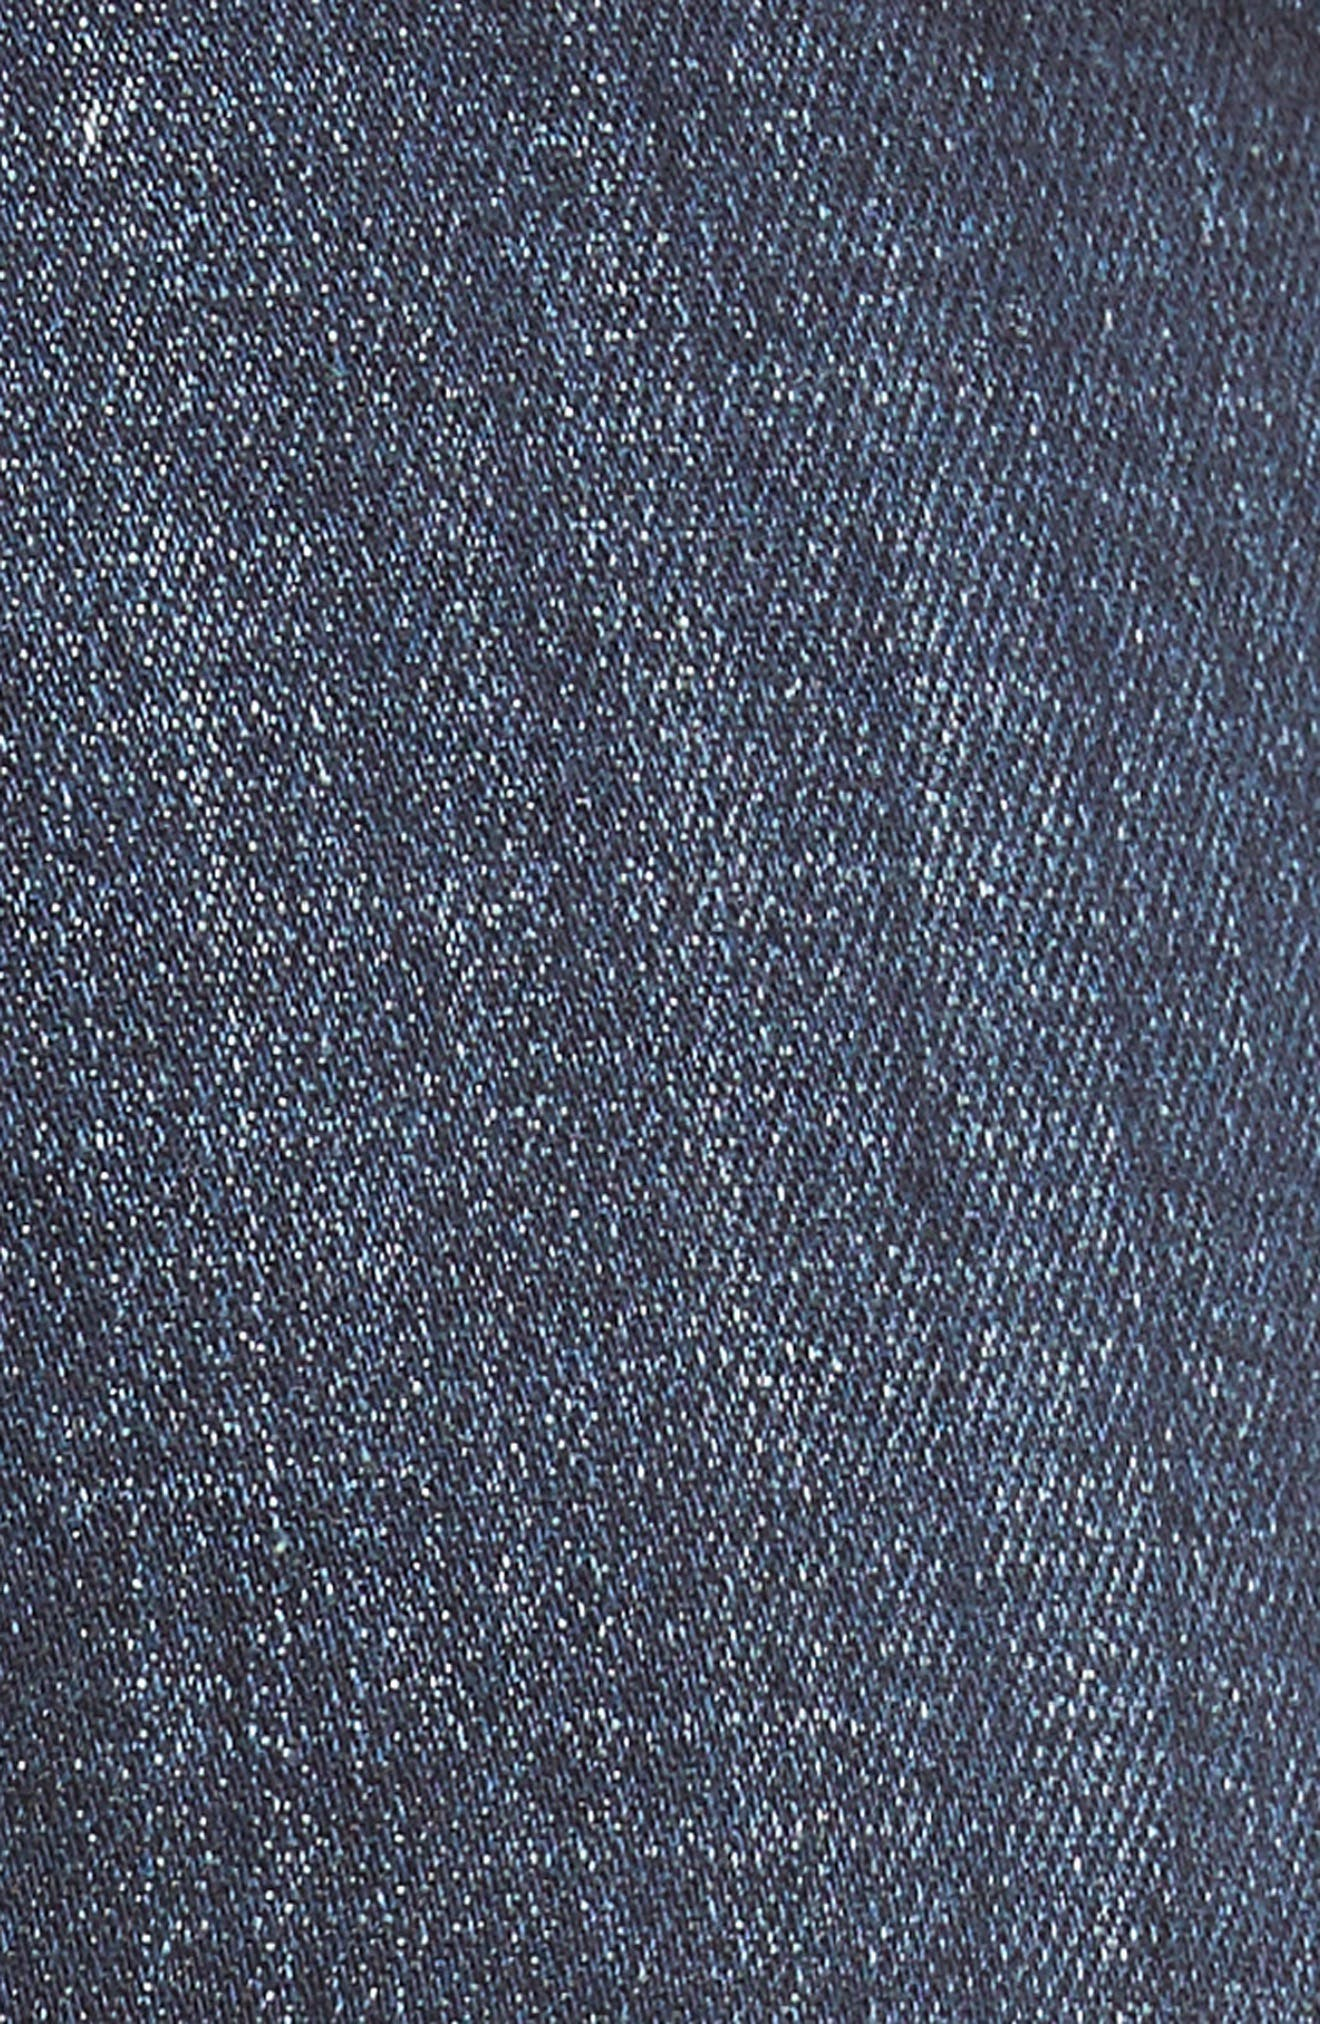 Release Hem Skinny Jeans,                             Alternate thumbnail 5, color,                             DARK AUTHENTIC